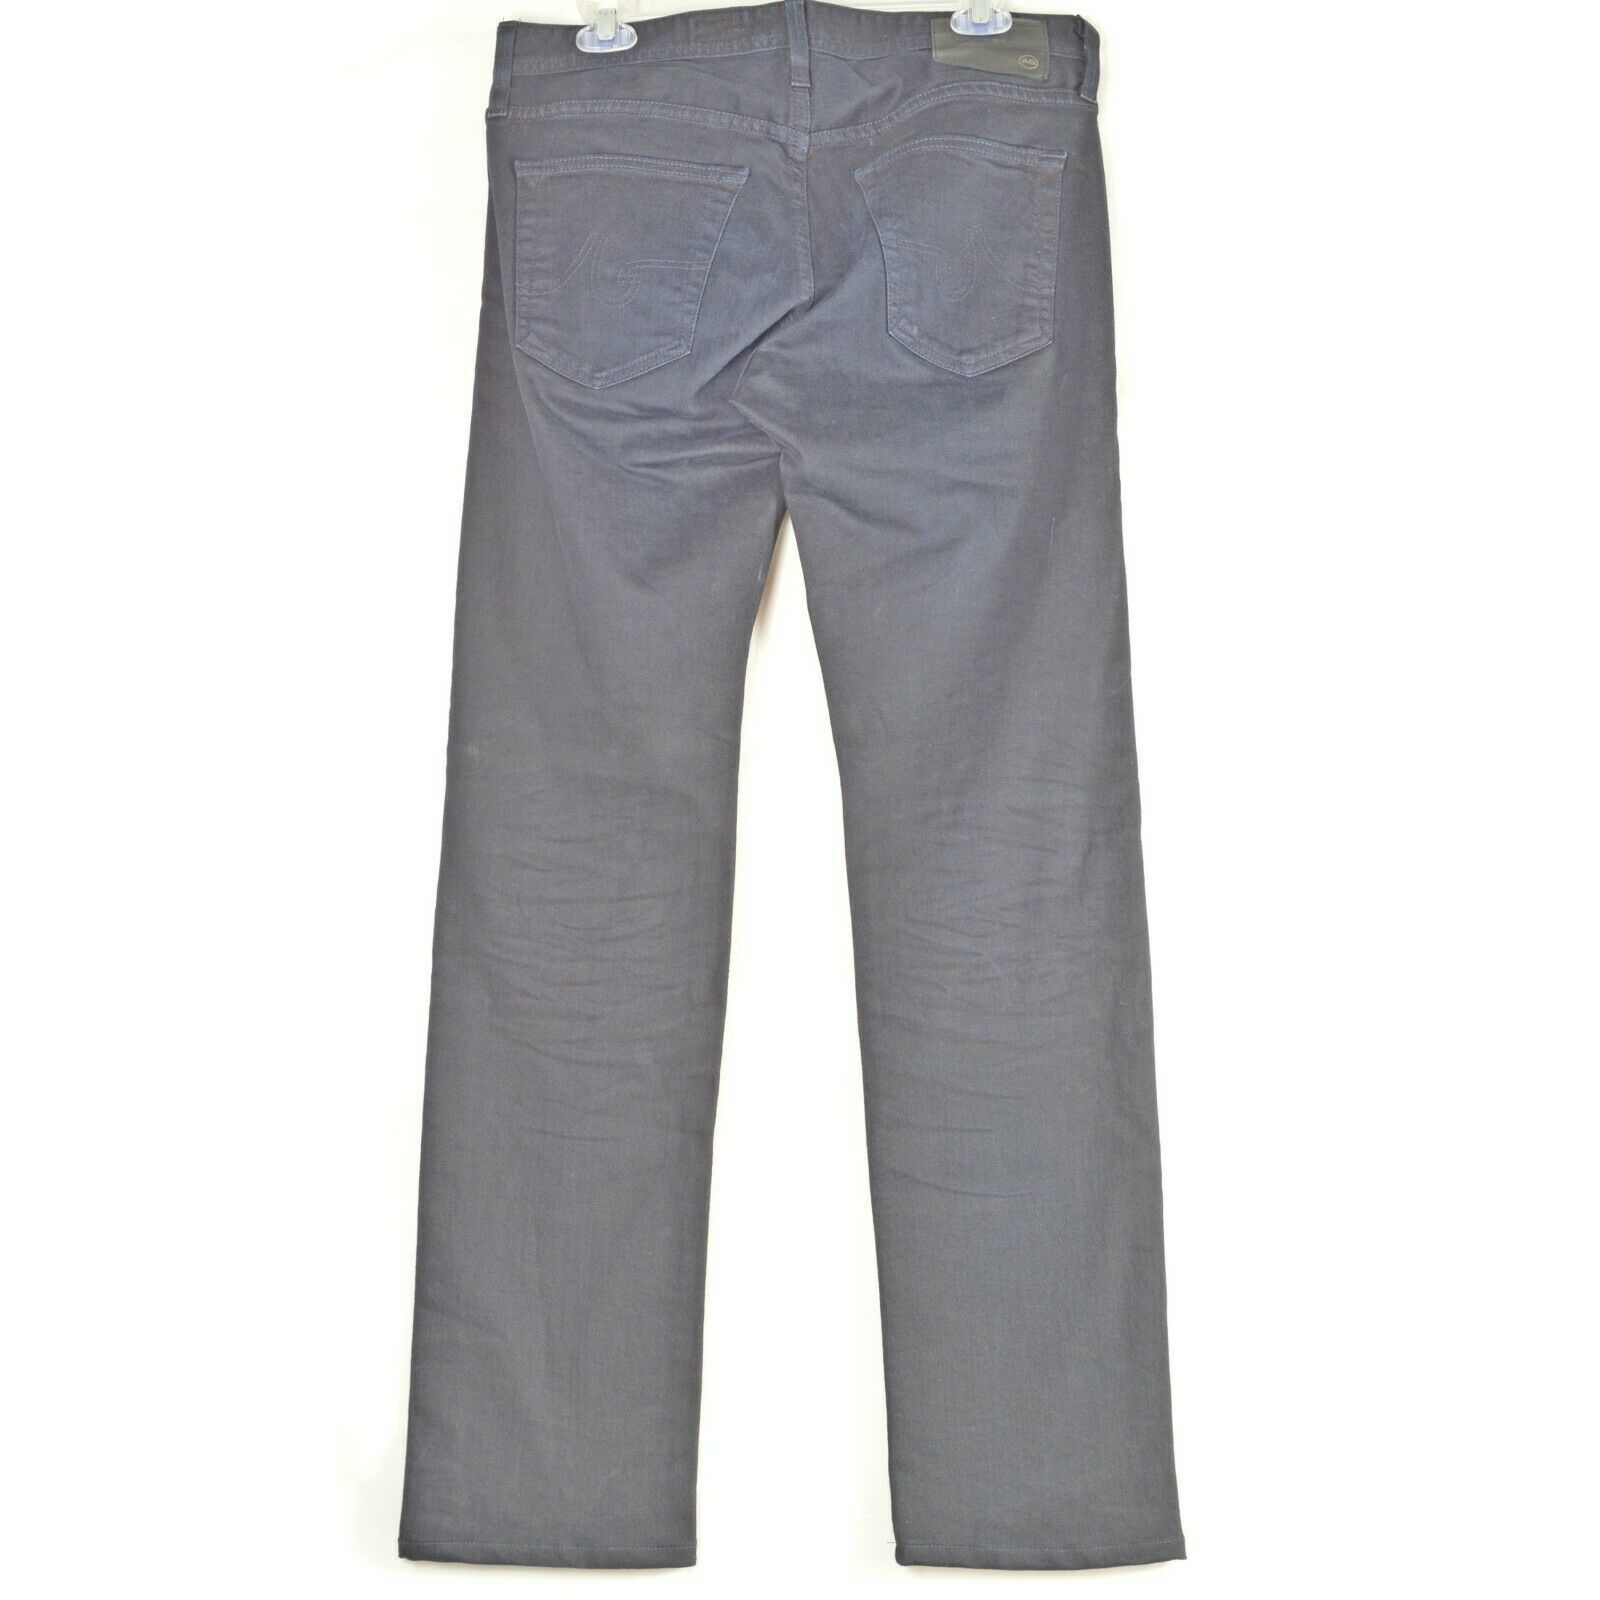 AG Adriano Goldschmied jeans 30 x 34 men Matchbox dark Slim Straight tall unique image 2